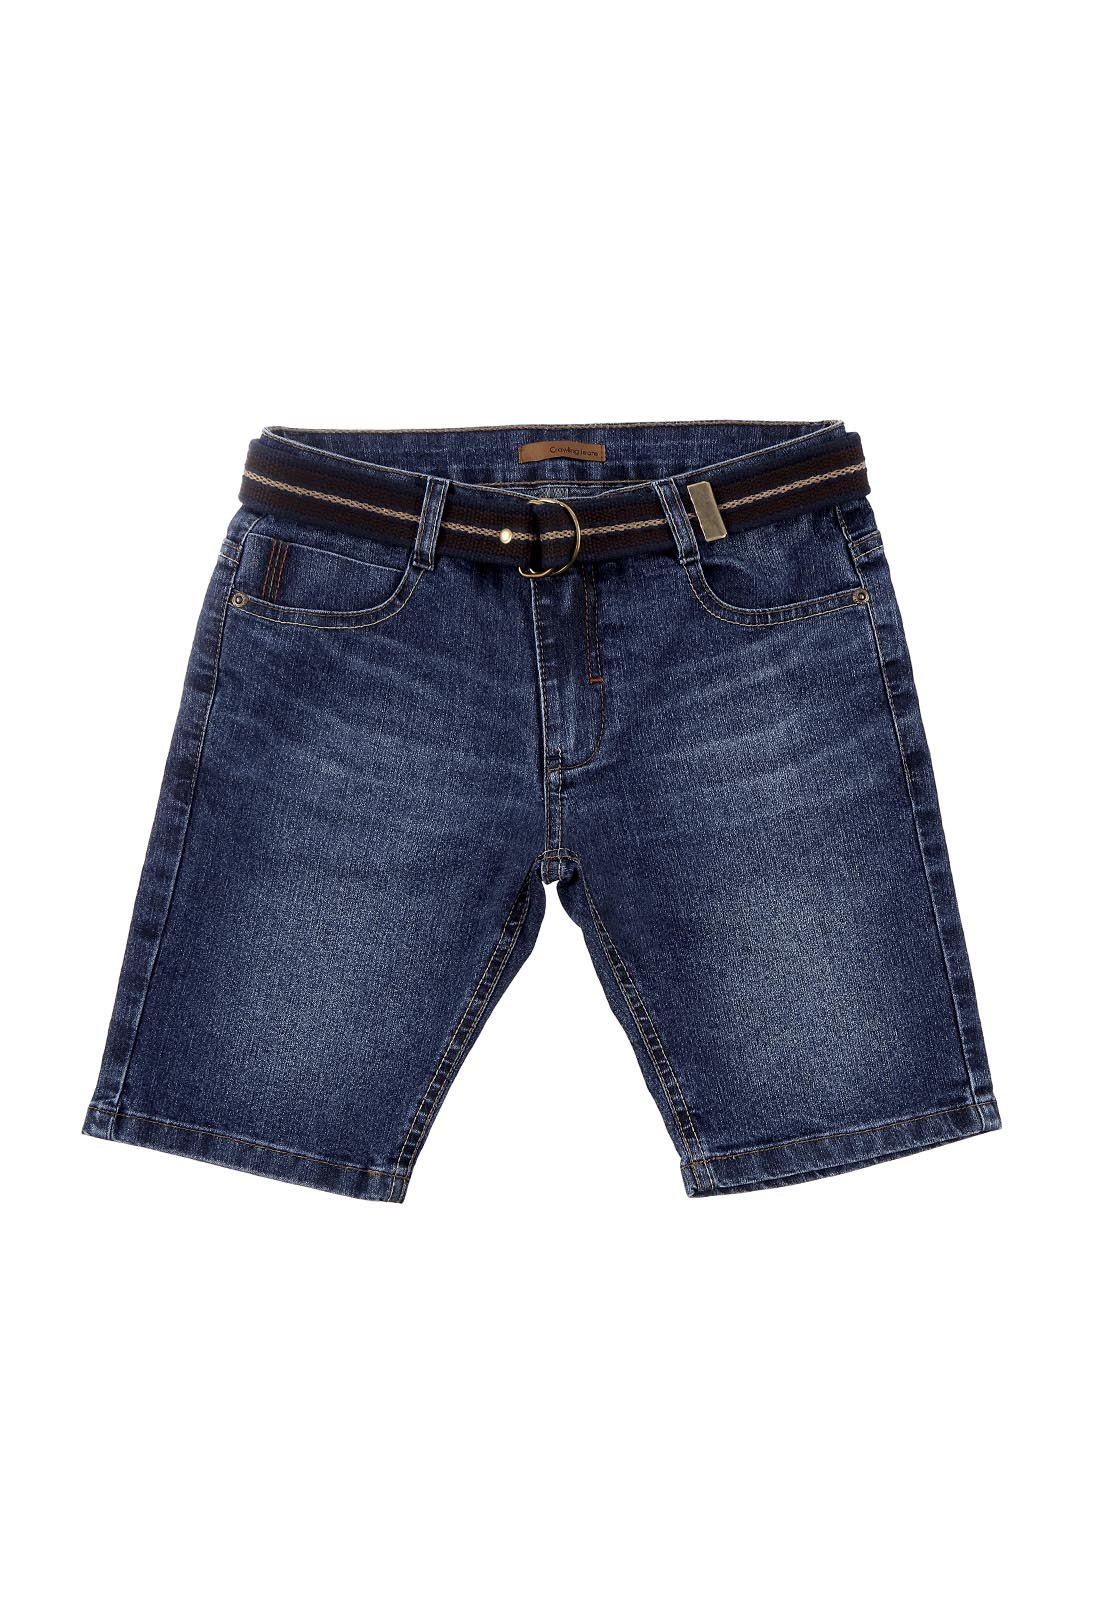 Bermuda Masculina Crawling Jeans com Cinto